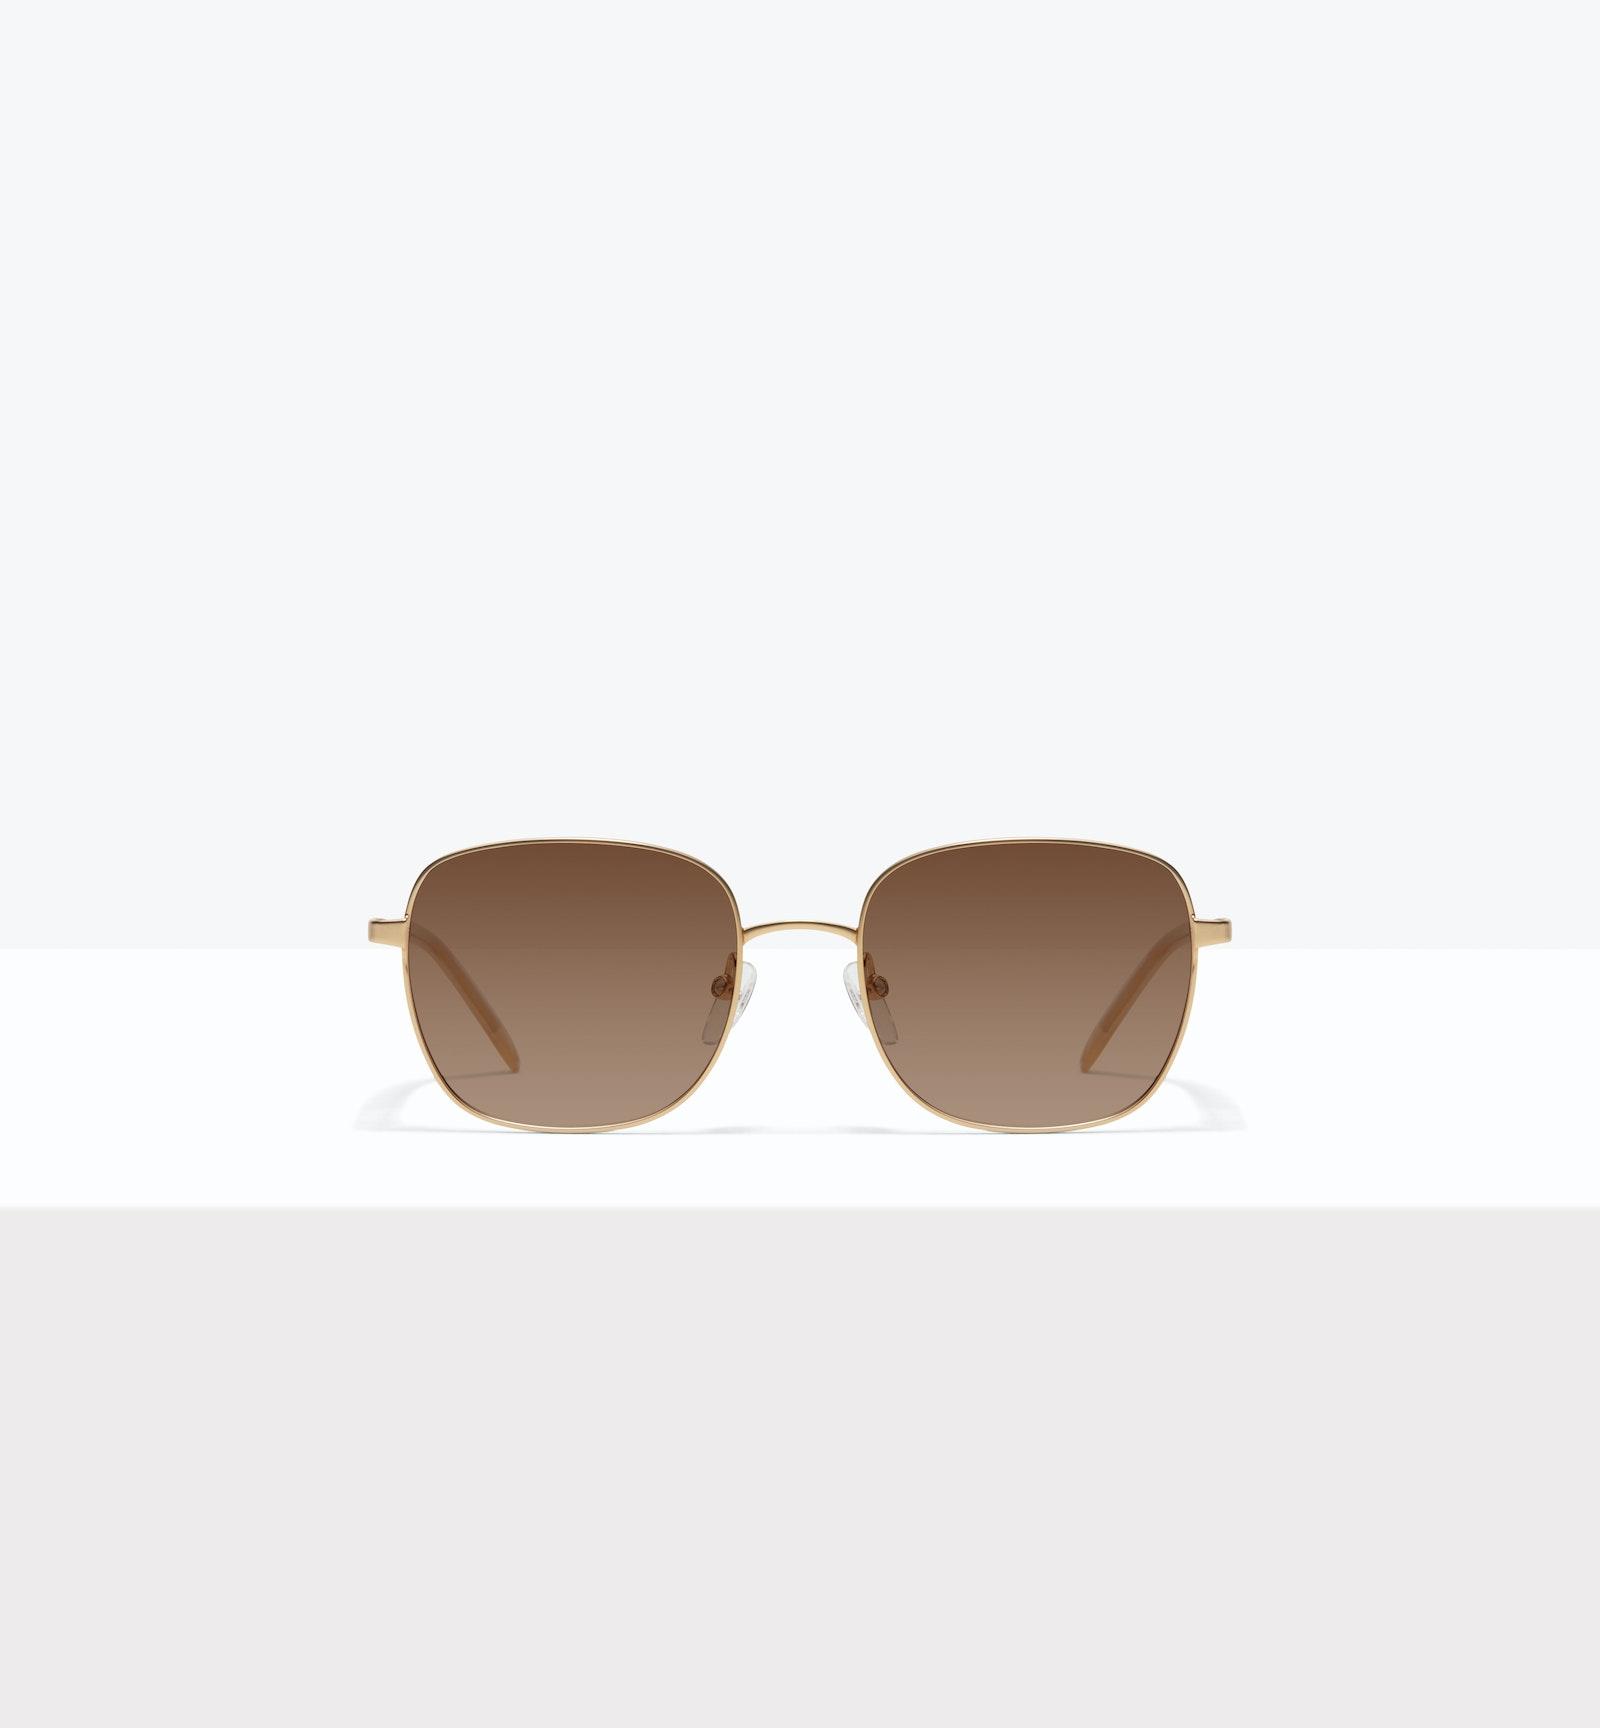 Affordable Fashion Glasses Square Sunglasses Women Henriette M Matte Gold